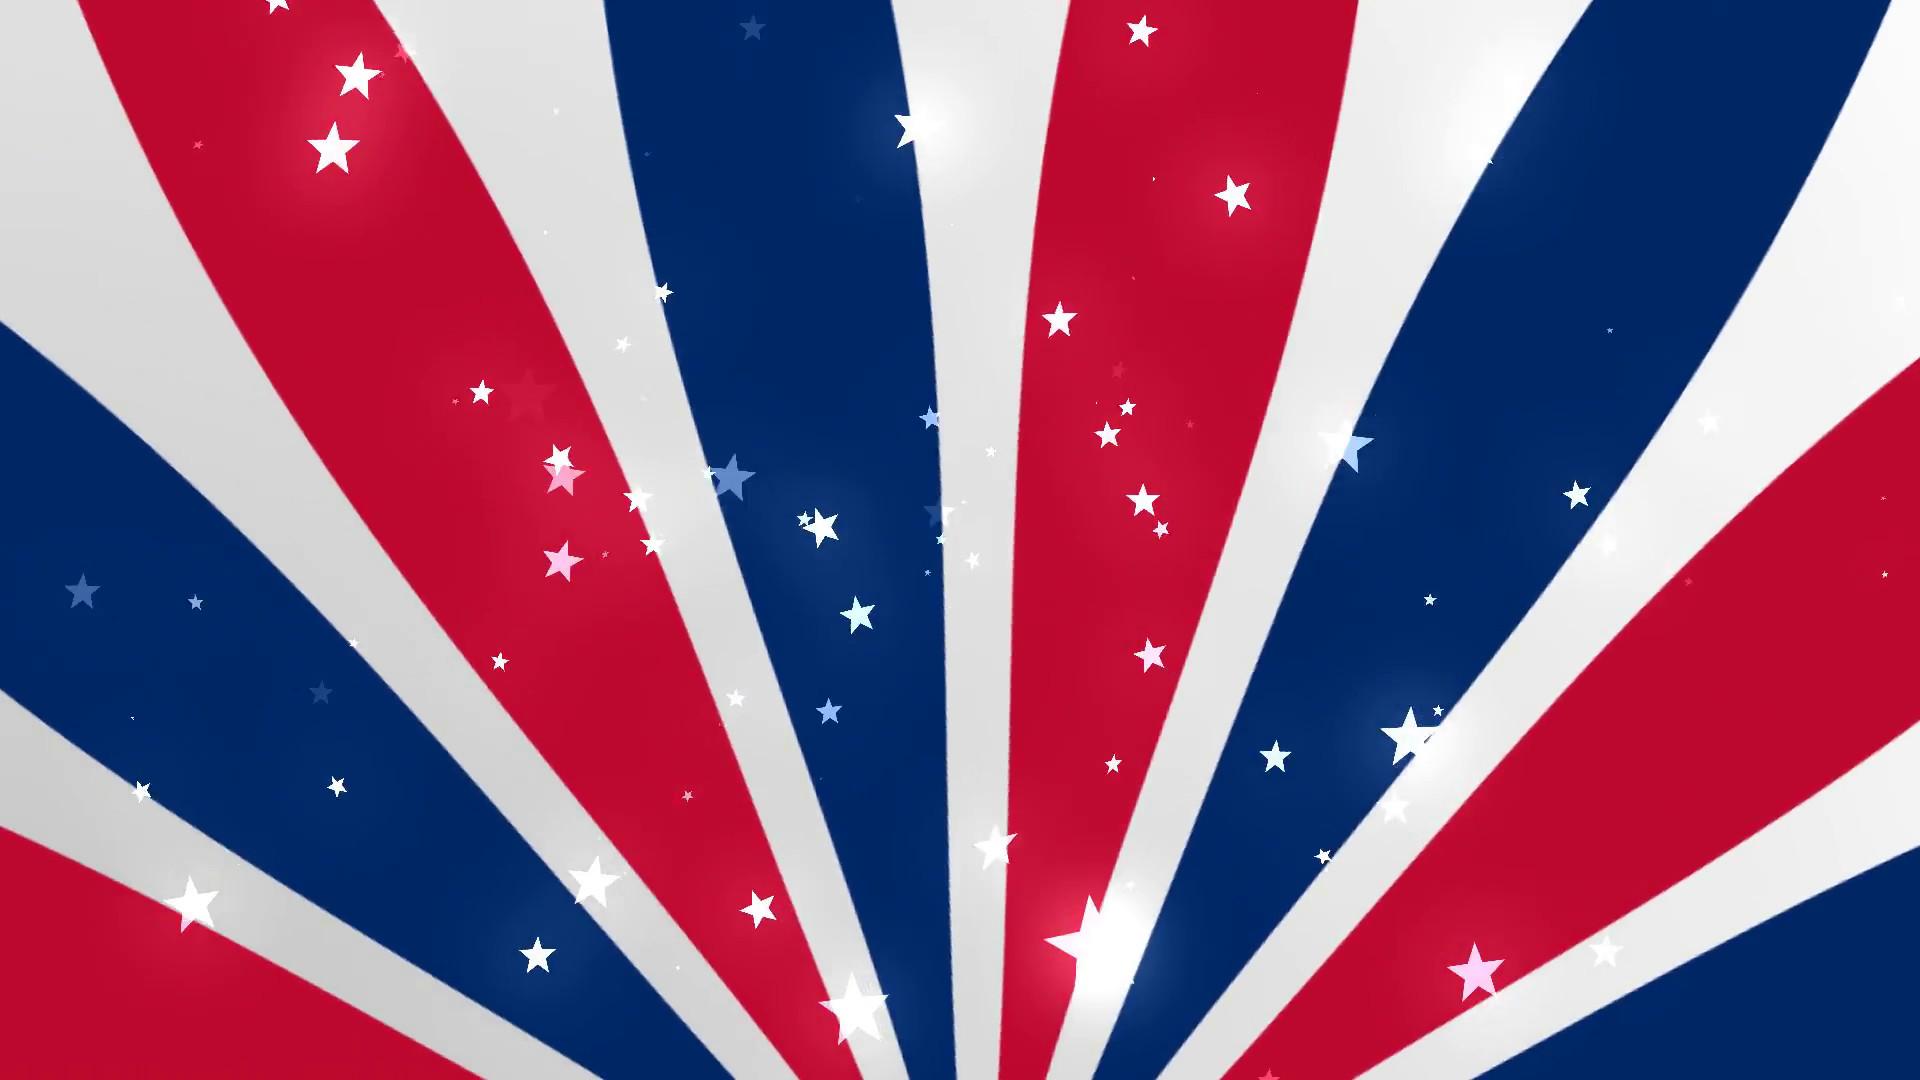 Stars and stripes background 44 images 1920x1080 usa patriotic stars and stripes 1 loopable background motion background videoblocks voltagebd Images